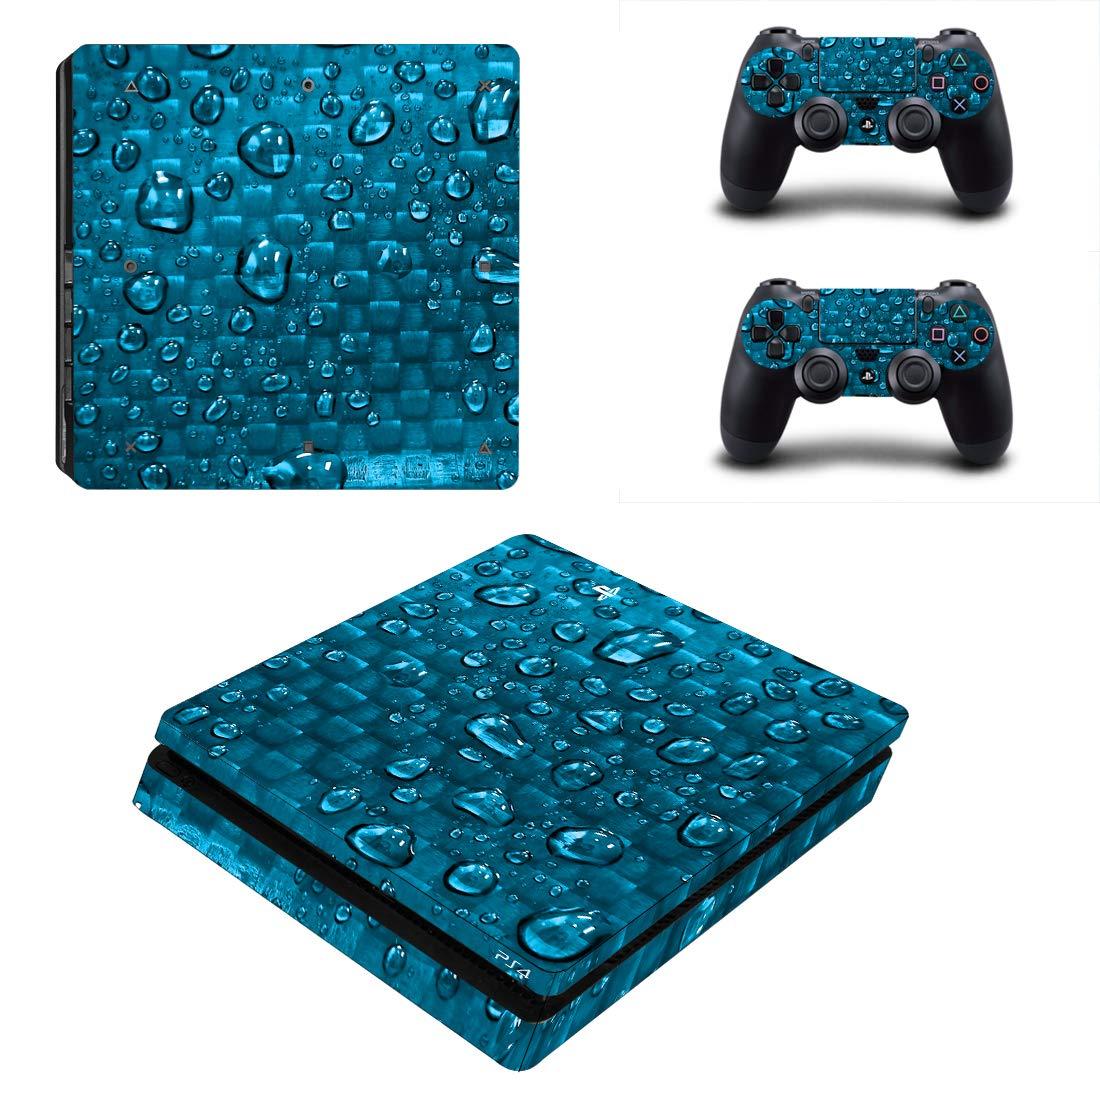 Adventure Games - PS4 SLIM - Carbon Fiber, Royal Blue, Wet - Playstation 4 Vinyl Console Skin Decal Sticker + 2 Controller Skins Set